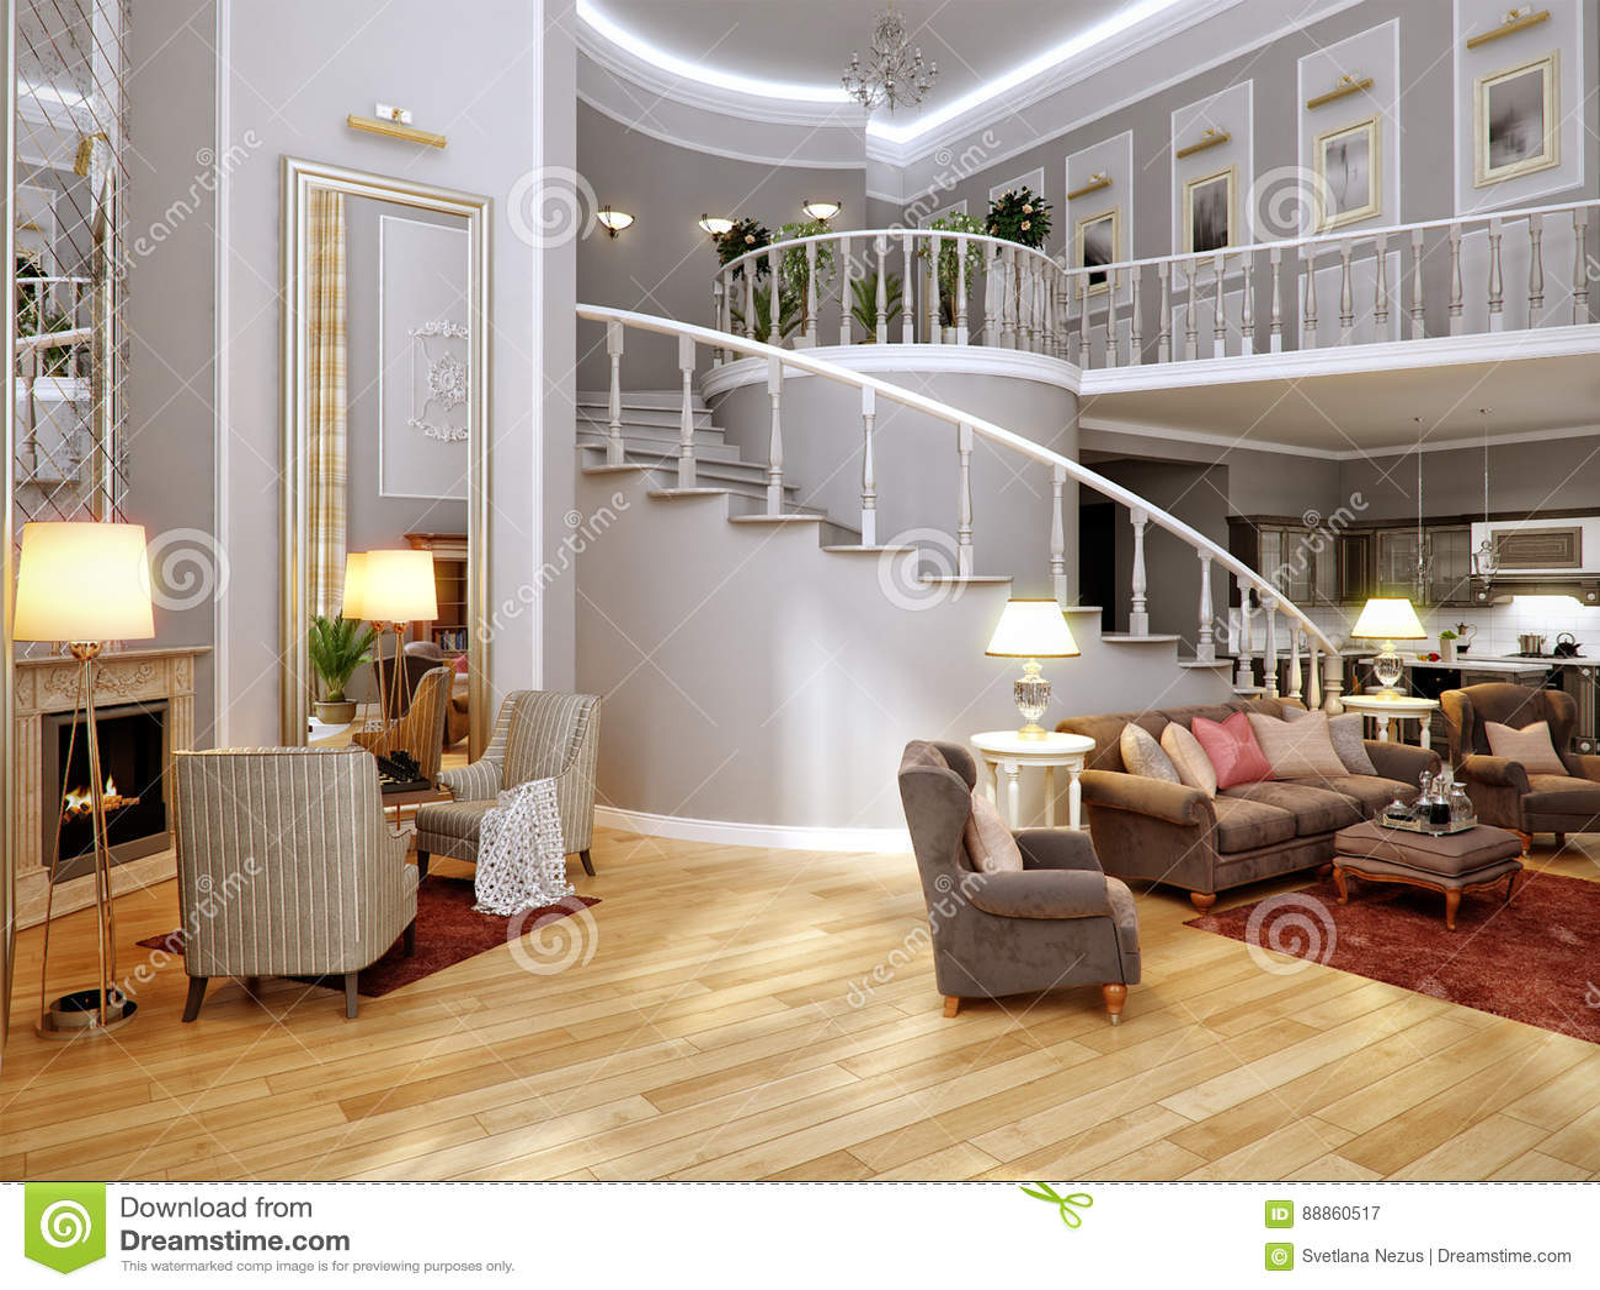 Best dise o cocina comedor ideas casas ideas im genes for Diseno de interiores sala de estar comedor